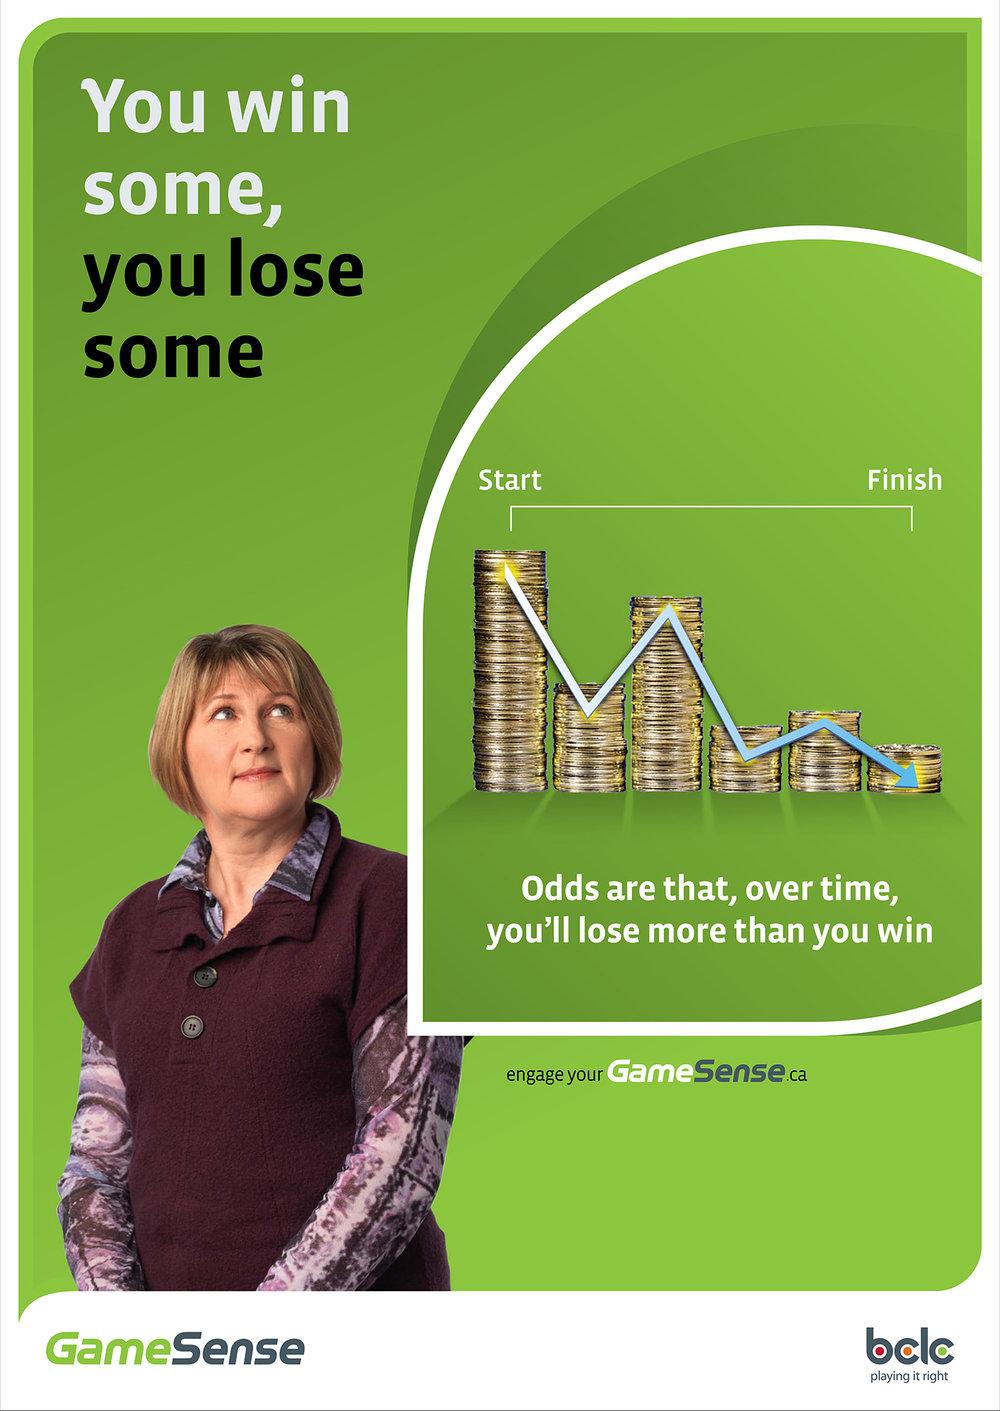 GS Poster Slots 01 1.jpg